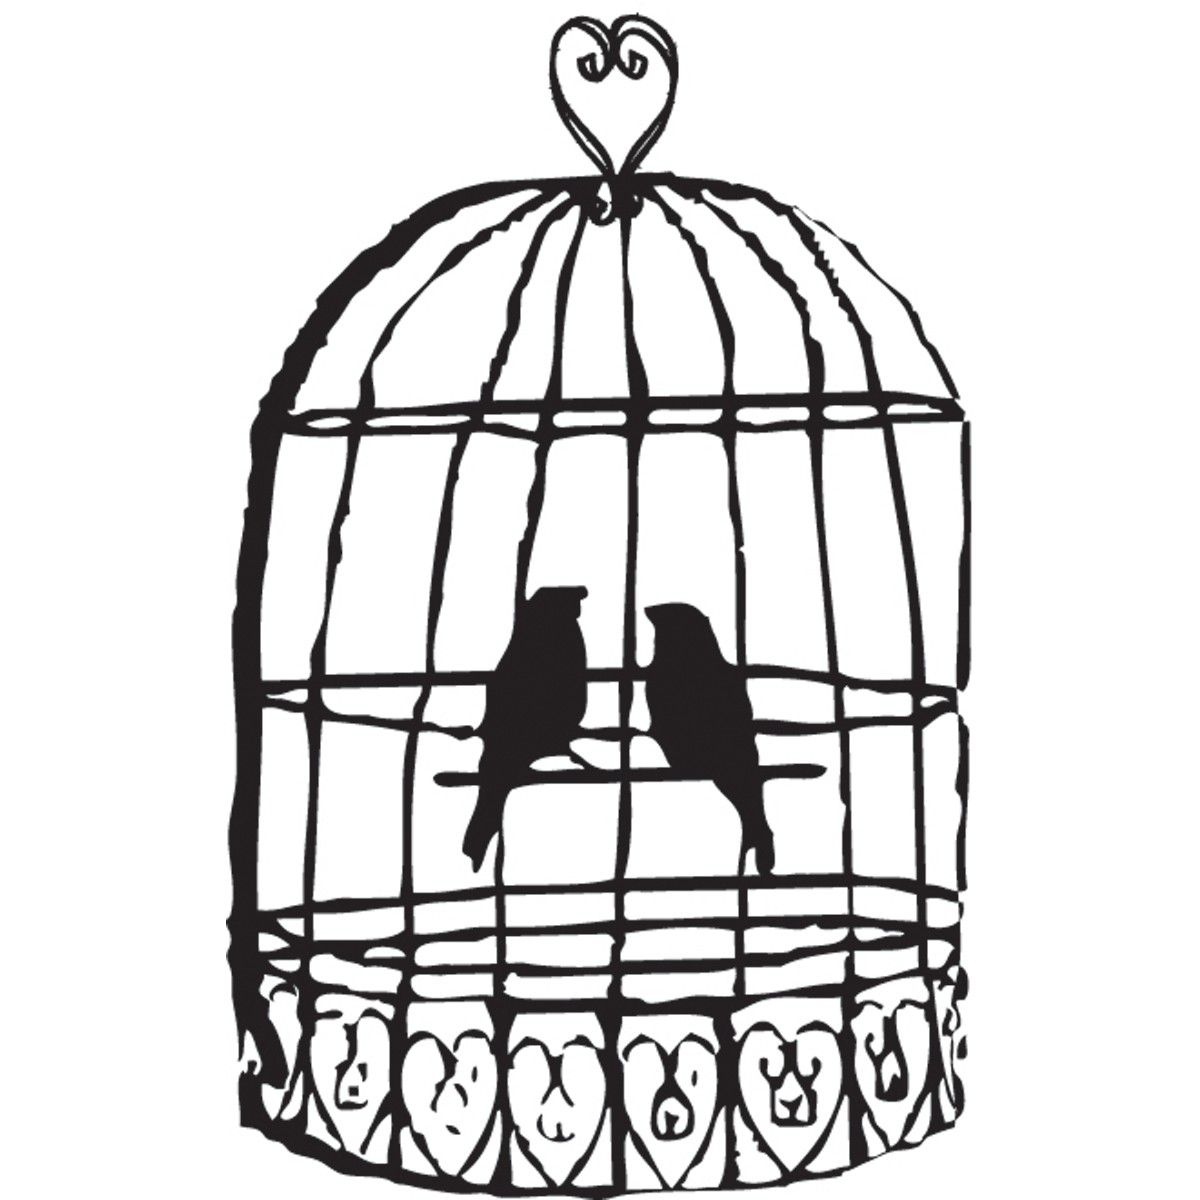 Cage clipart black and white. Birdcage bird clip art